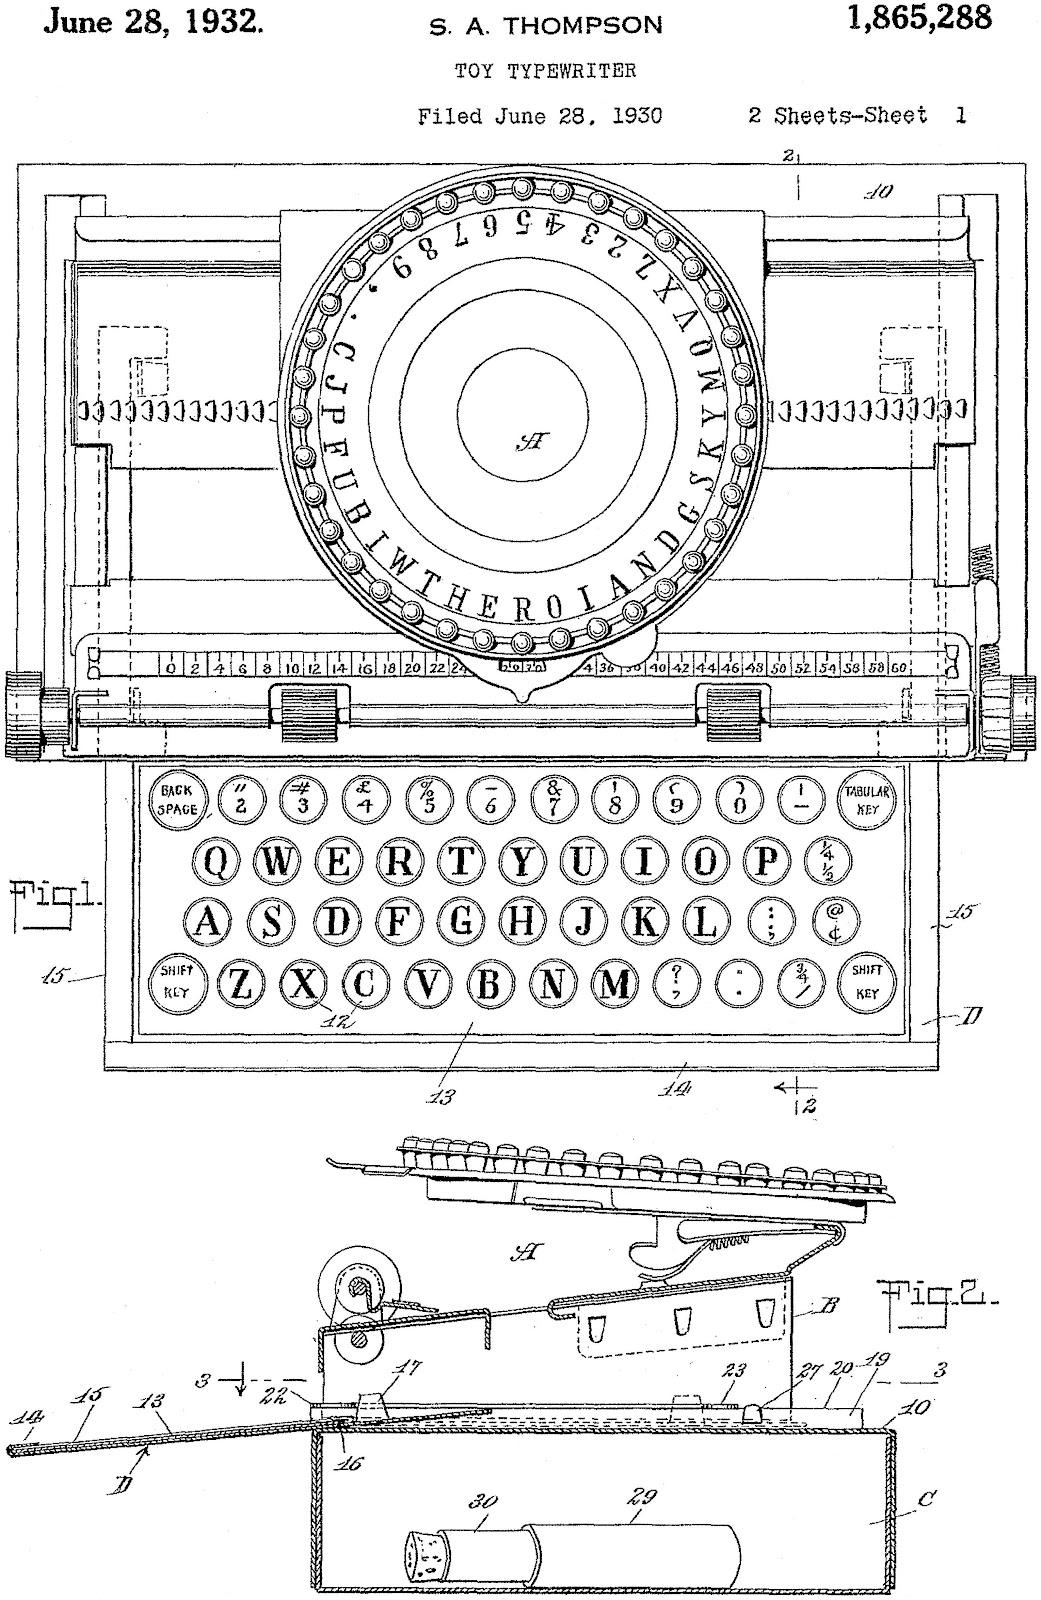 oz.Typewriter: The Simplex Typewriter: Glorious Simplicity!